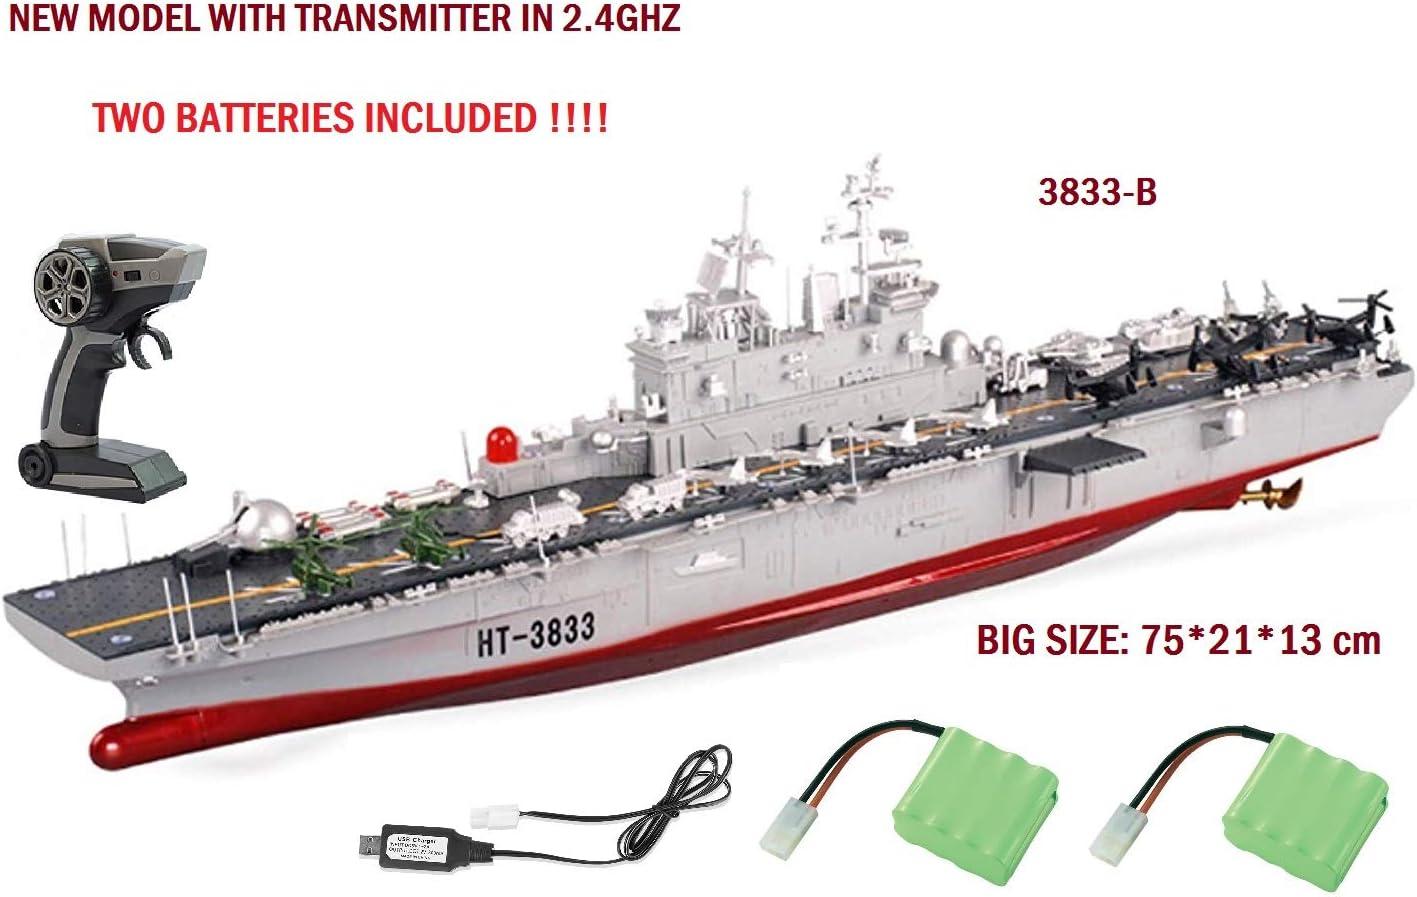 MODELTRONIC Barco Gigante Radio Control Escala 1:350 navío RC Buque de Asalto Anfibio US Wasp HT-3833B con emisora en 2.4G/ Lancha radiocontrol / Barco teledirigido / Incluye 2 x BATERIAS